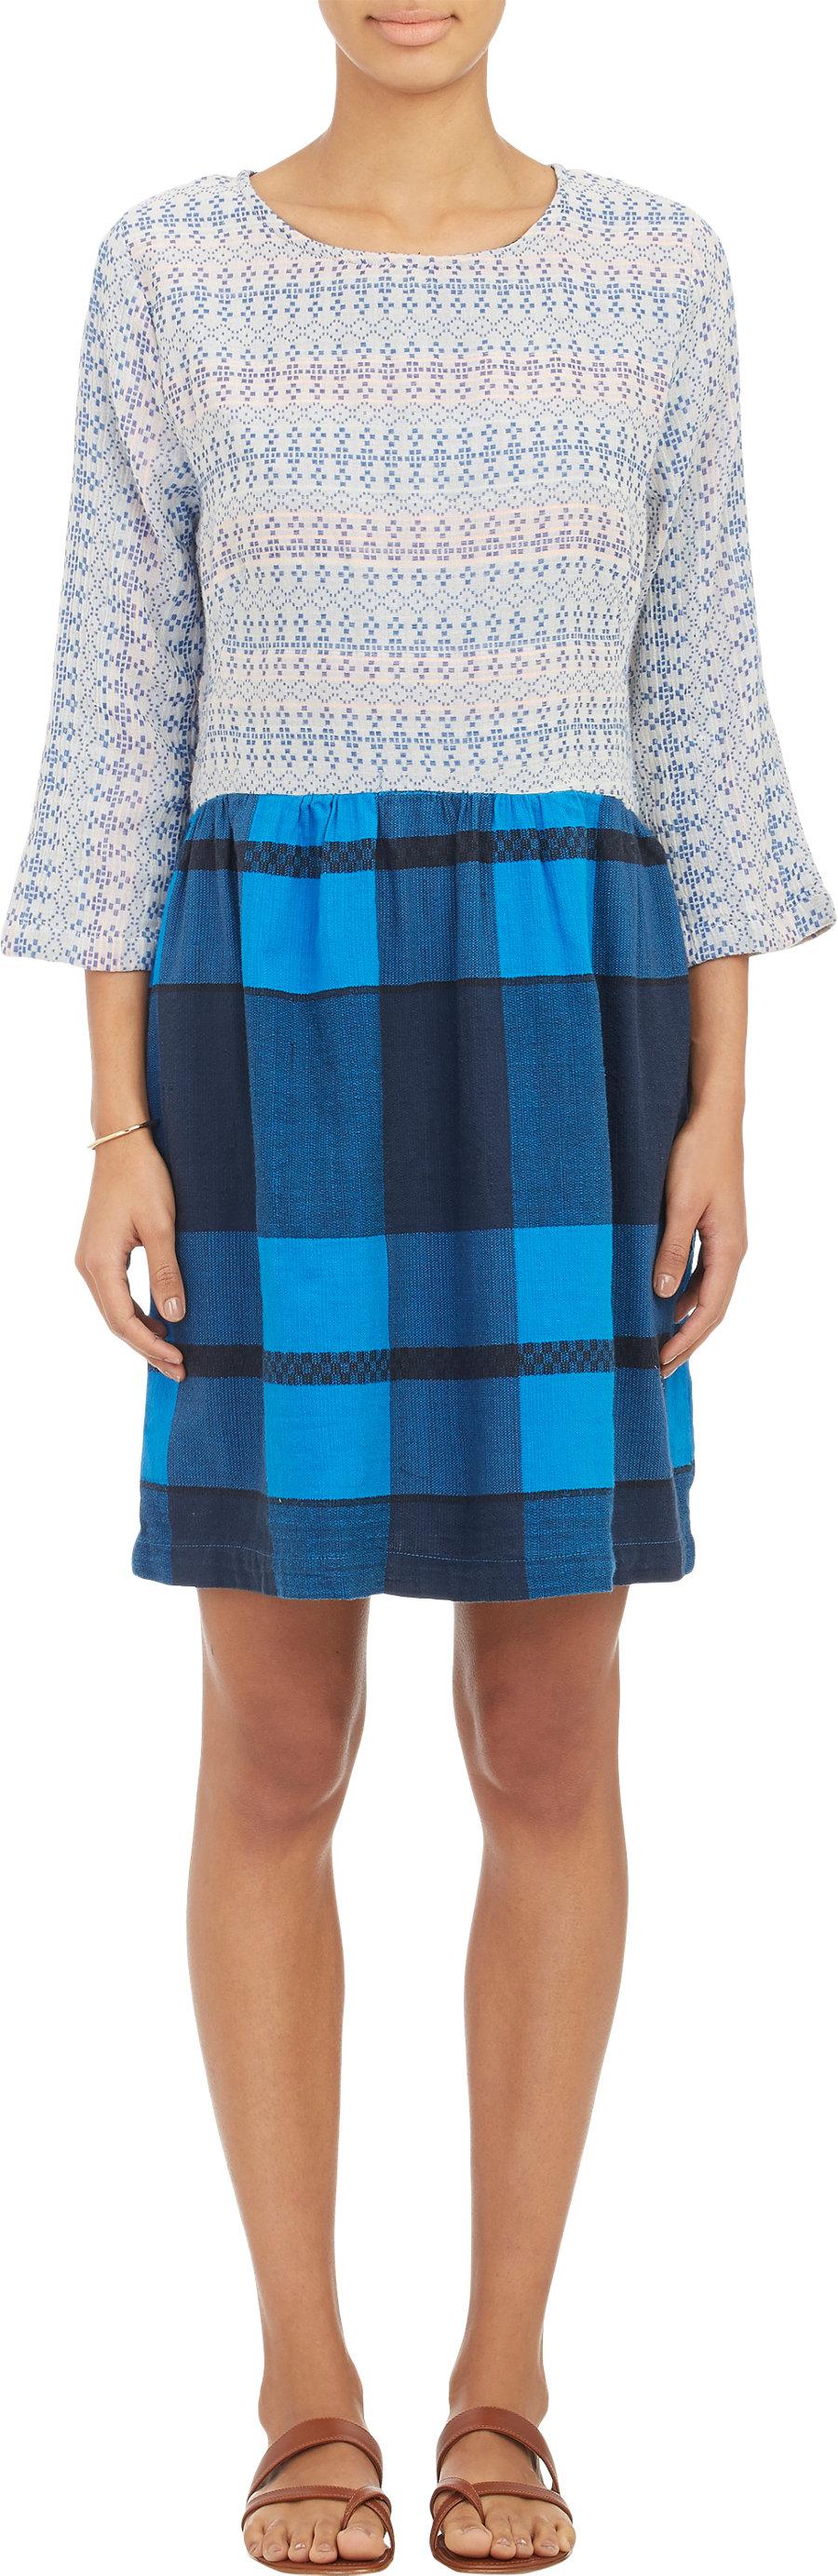 Ace & Jig Dutch Blue and Indigo Check Chalet Dress | Barneys Exclusive!